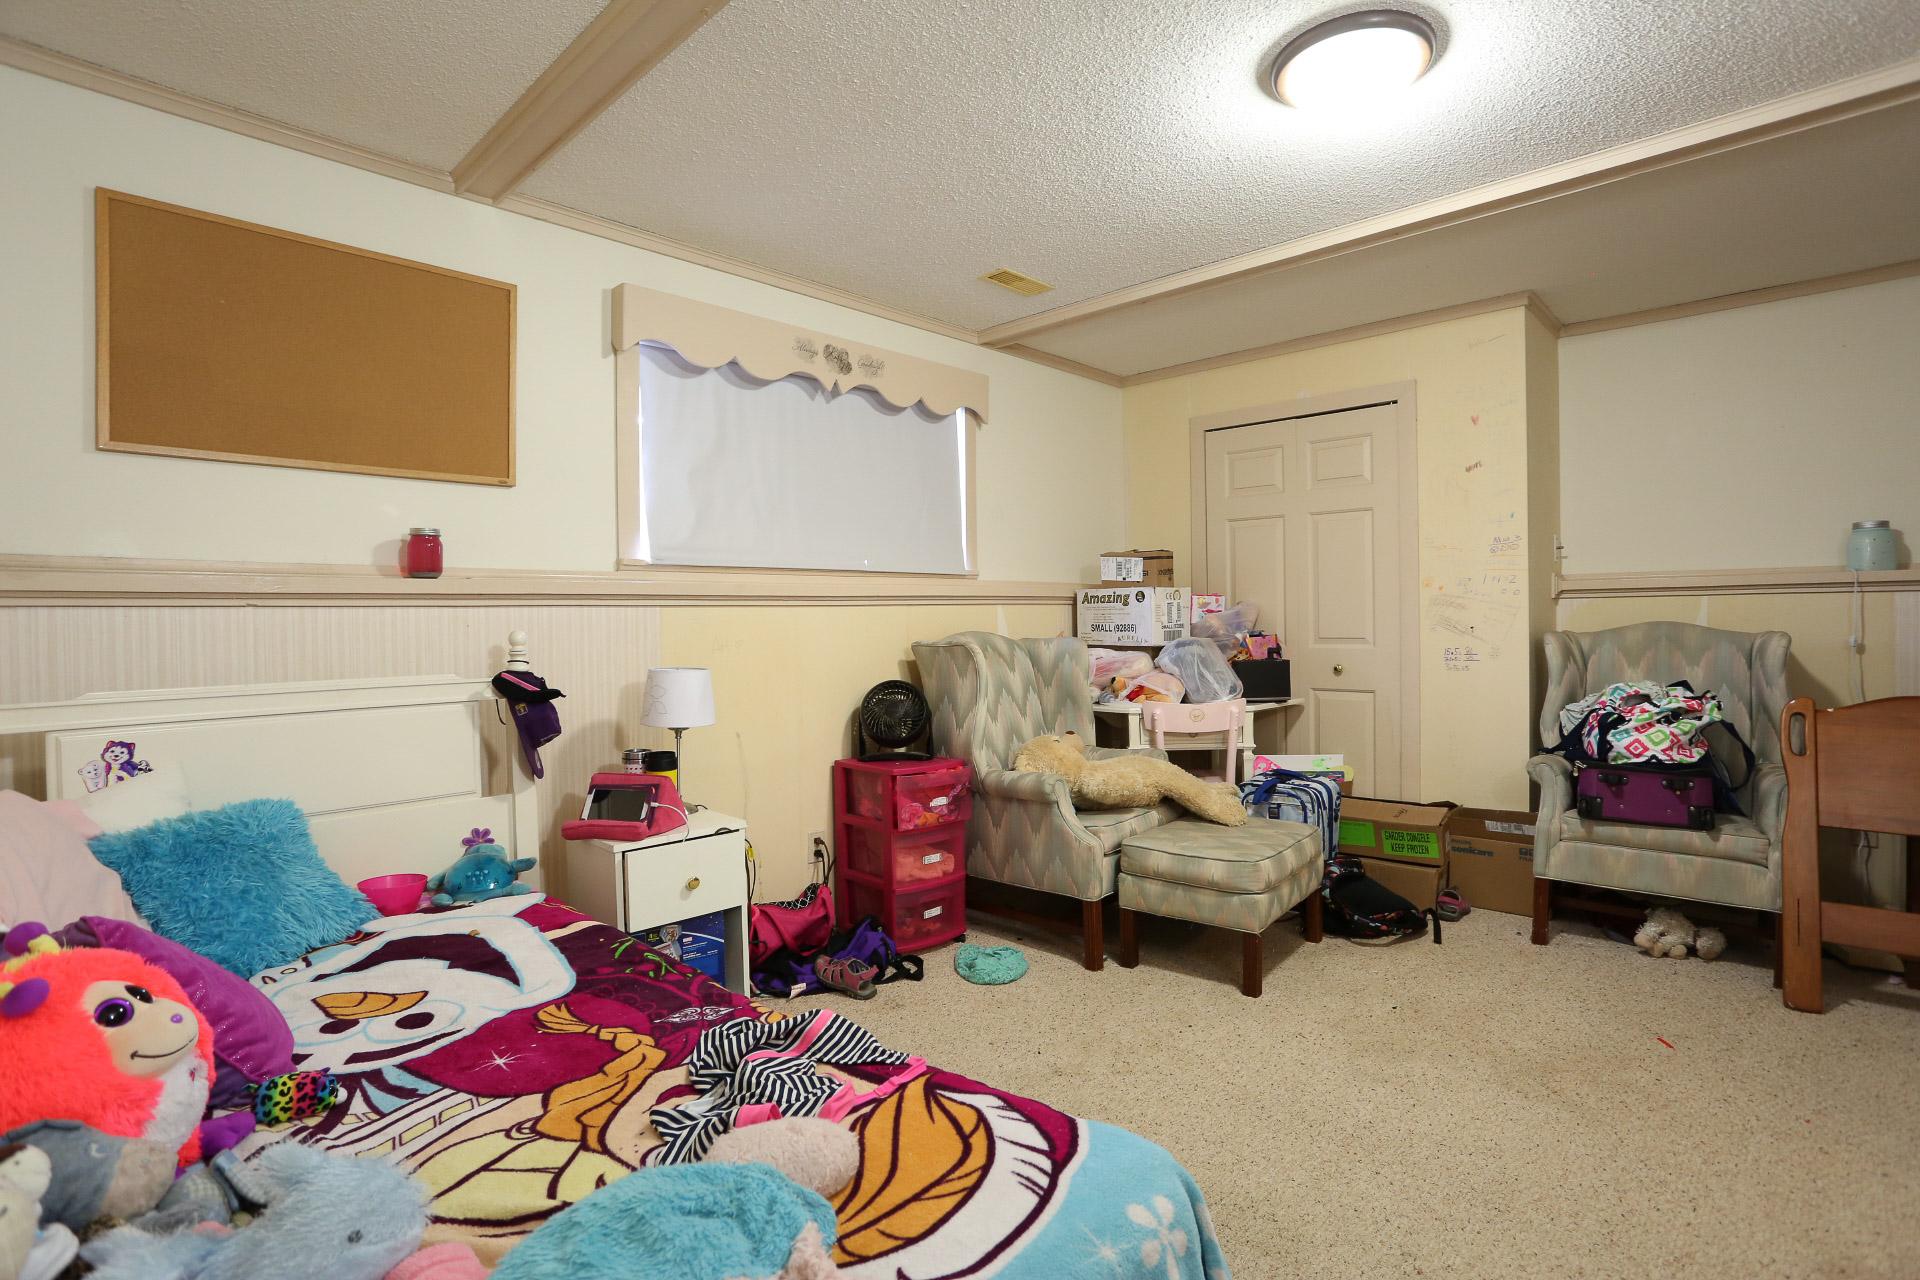 Foyston Bedroom - Before Renovation